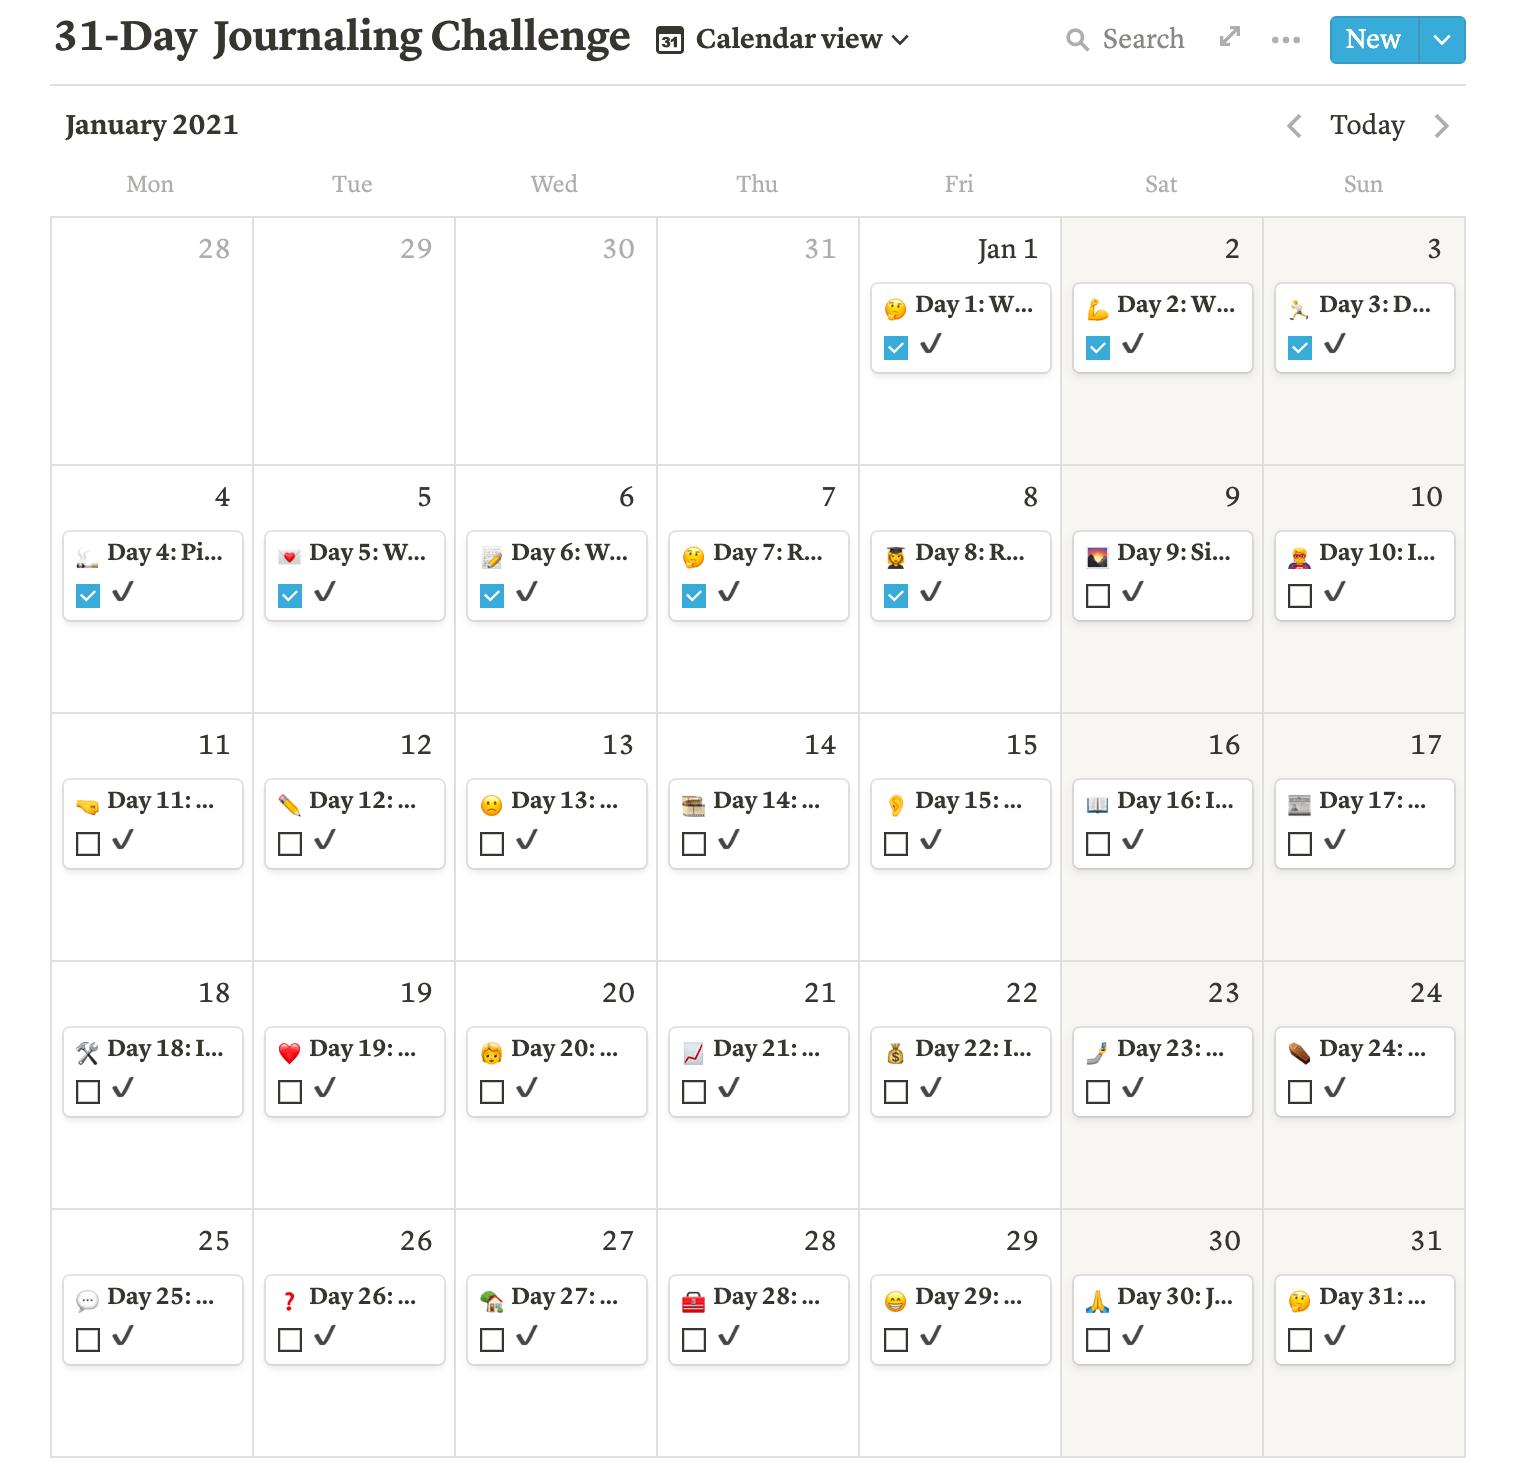 31-Day Journaling Challenge